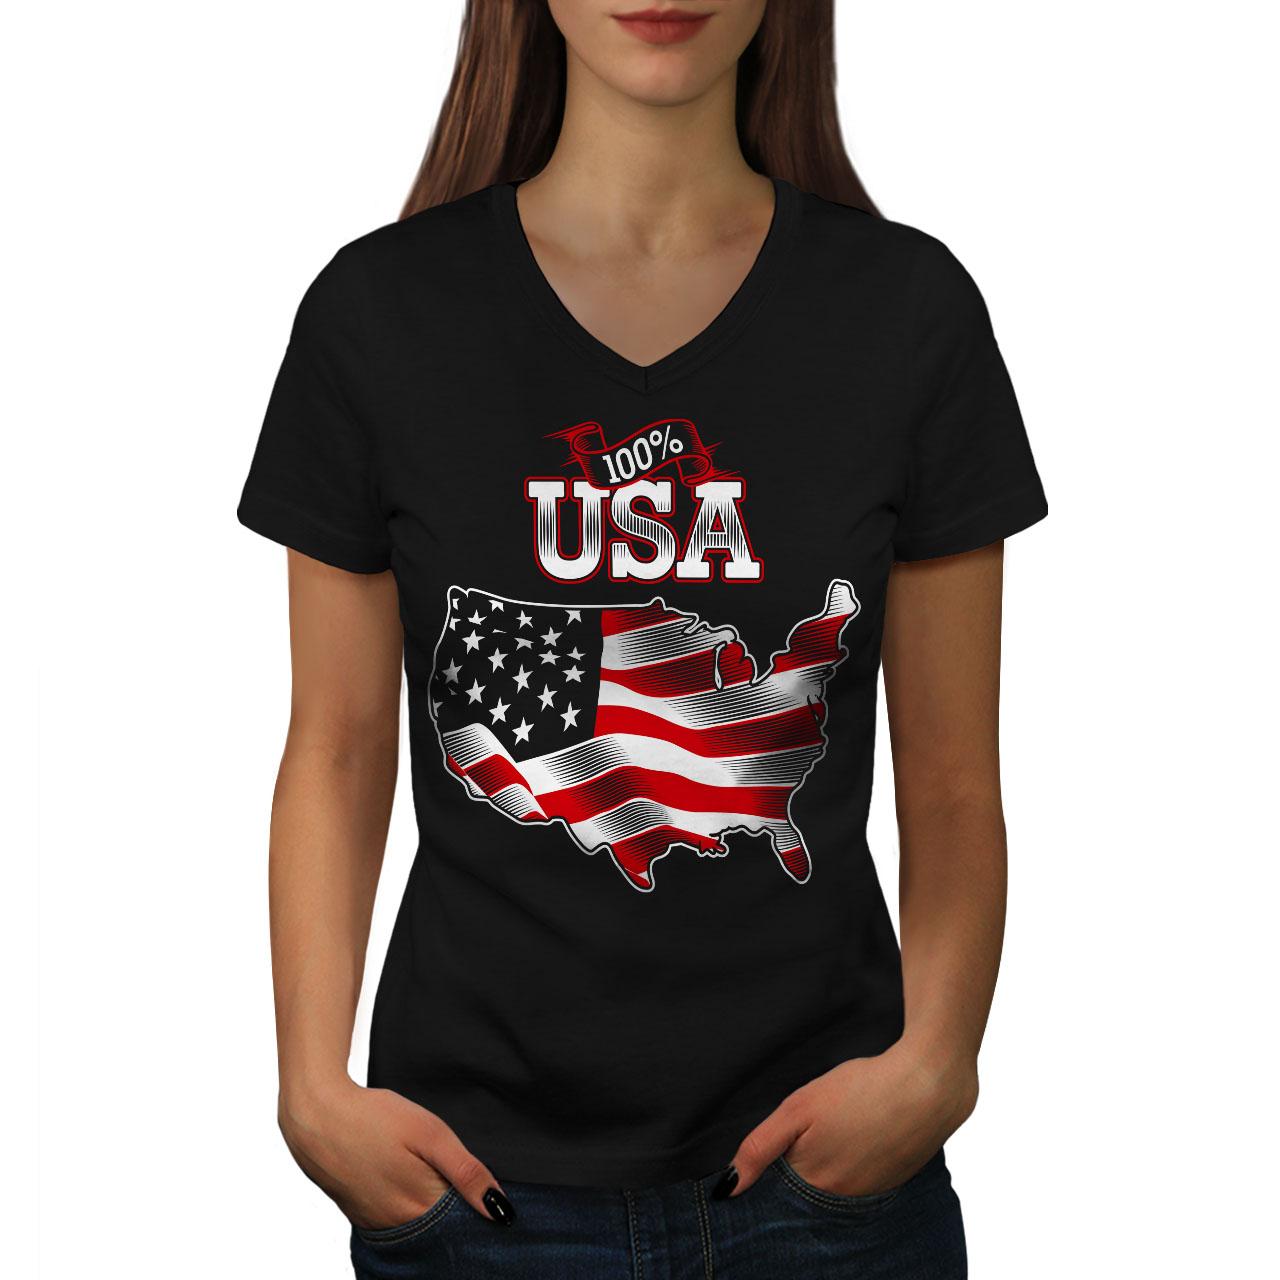 Wellcoda-American-Flag-Womens-V-Neck-T-shirt-USA-Country-Graphic-Design-Tee thumbnail 3